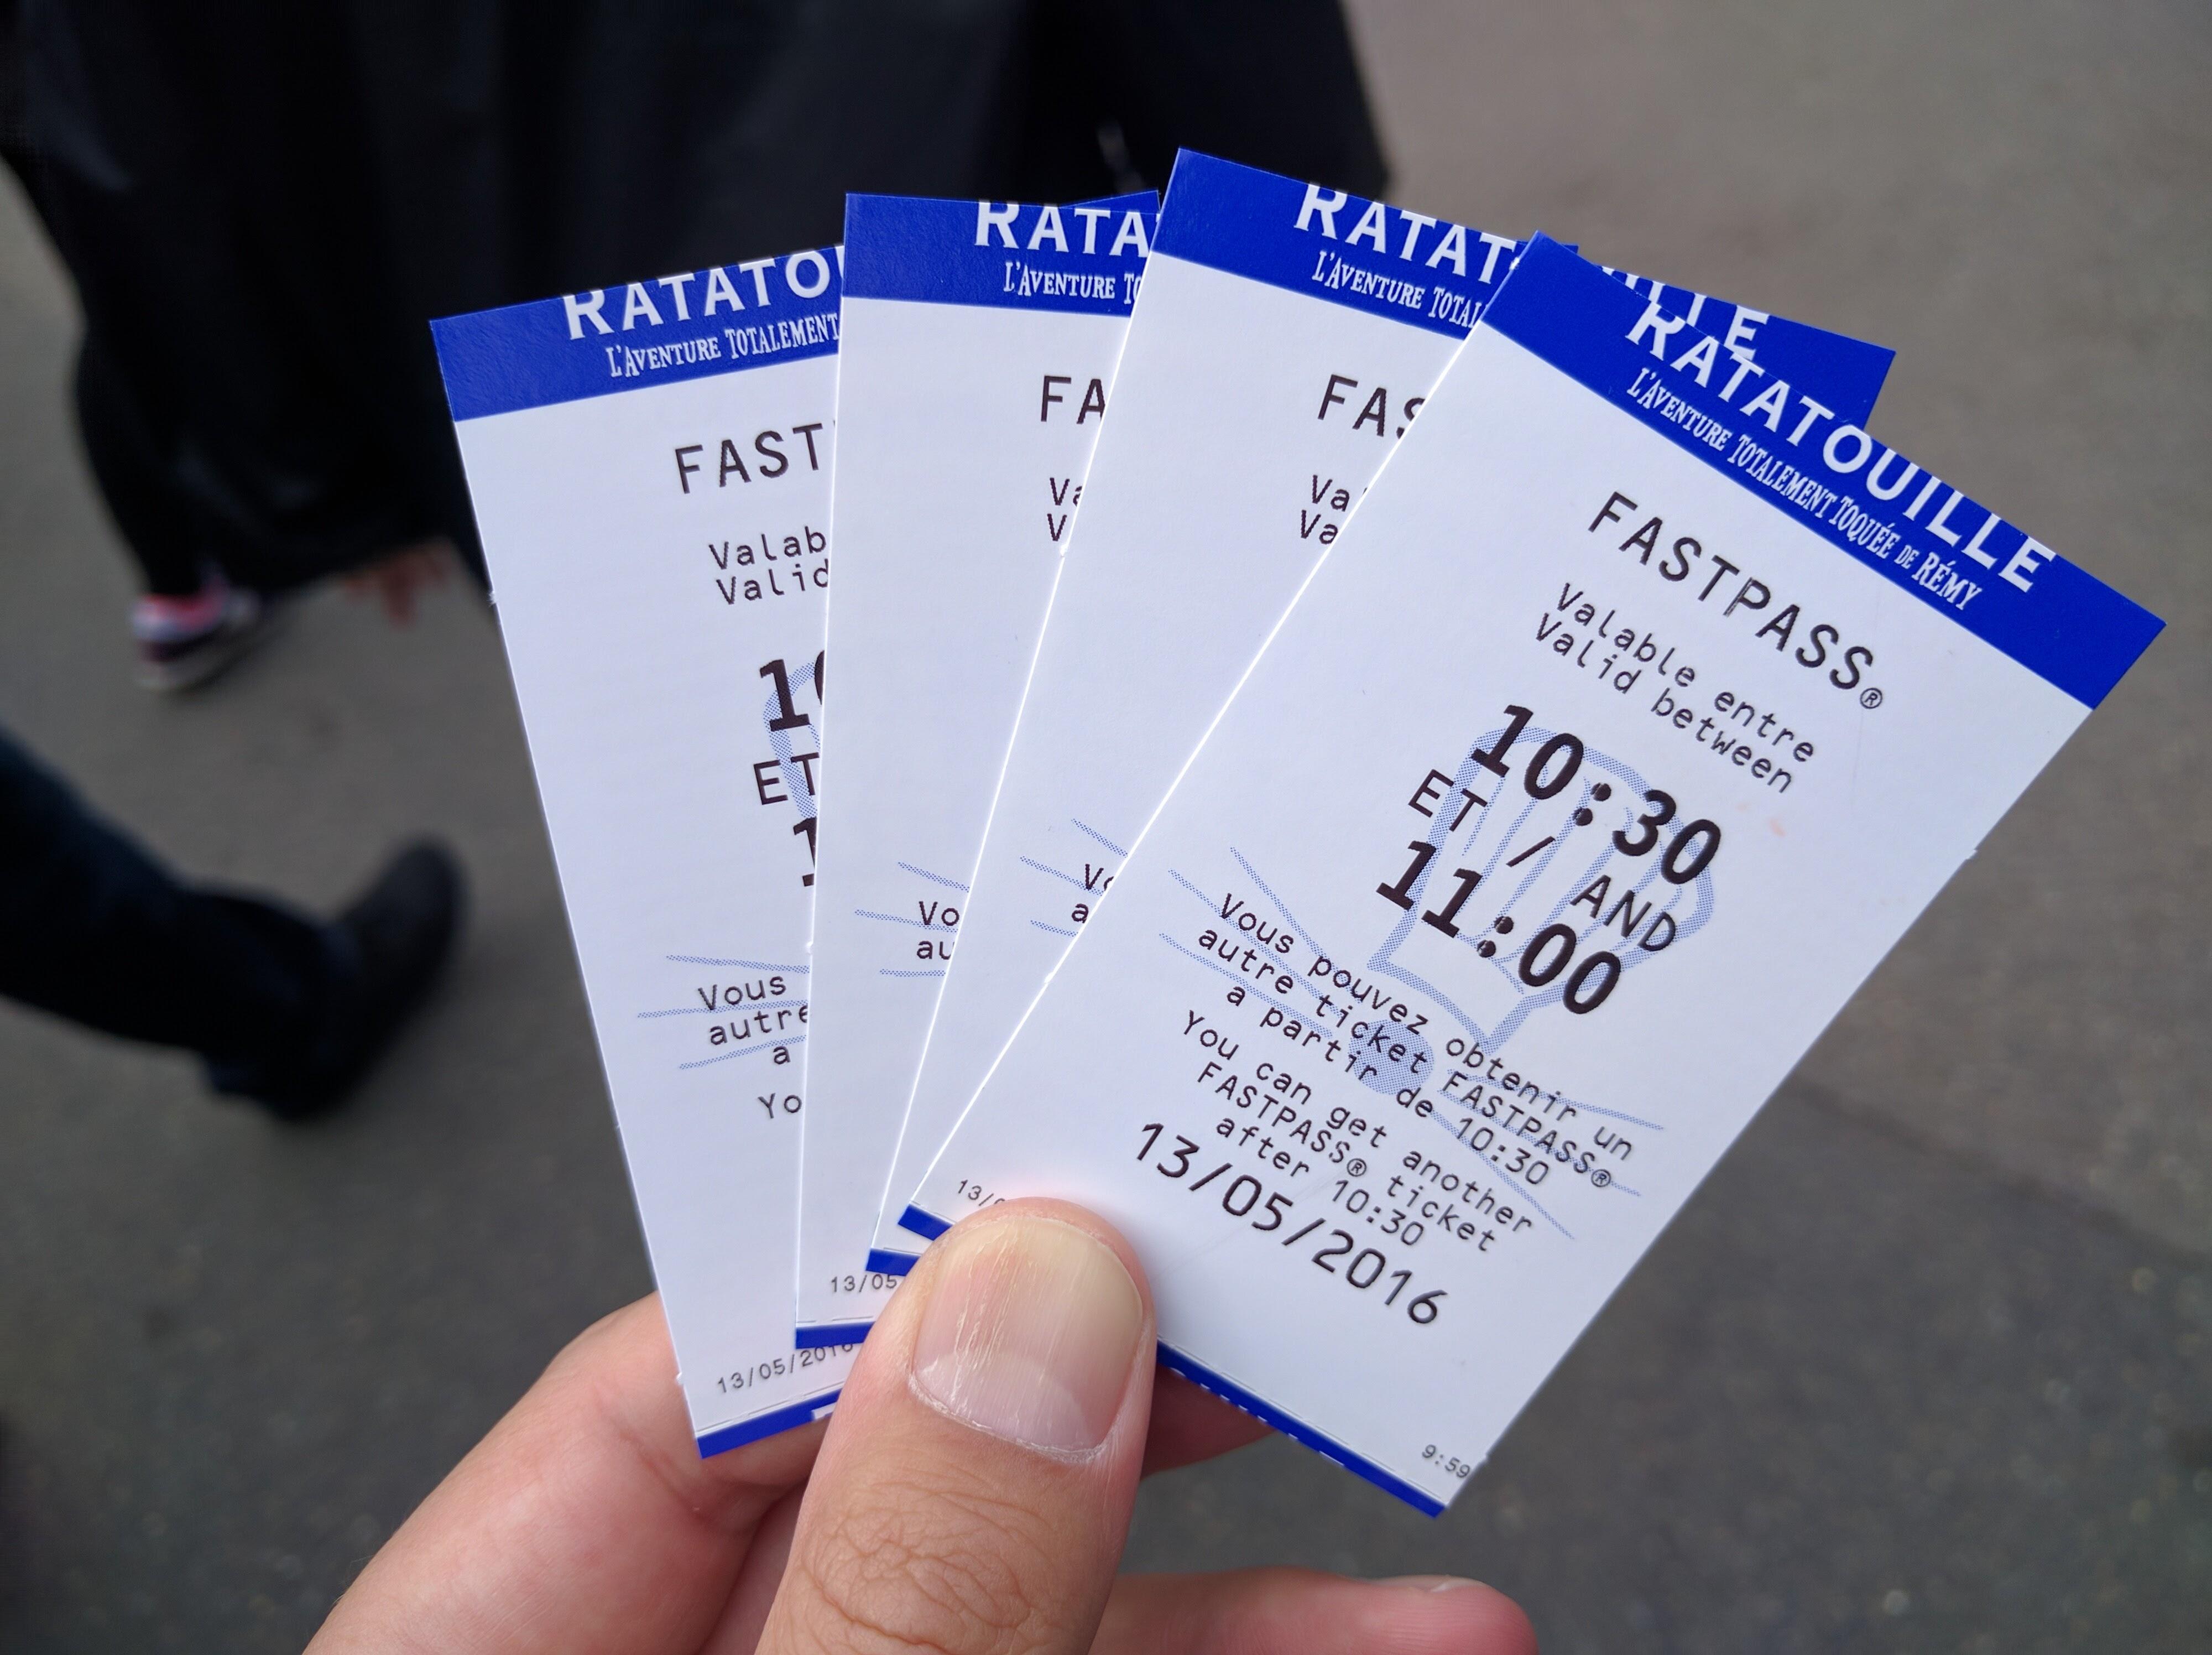 Disneyland Paris Fastpass - Walt Disney Studios Ratatouille